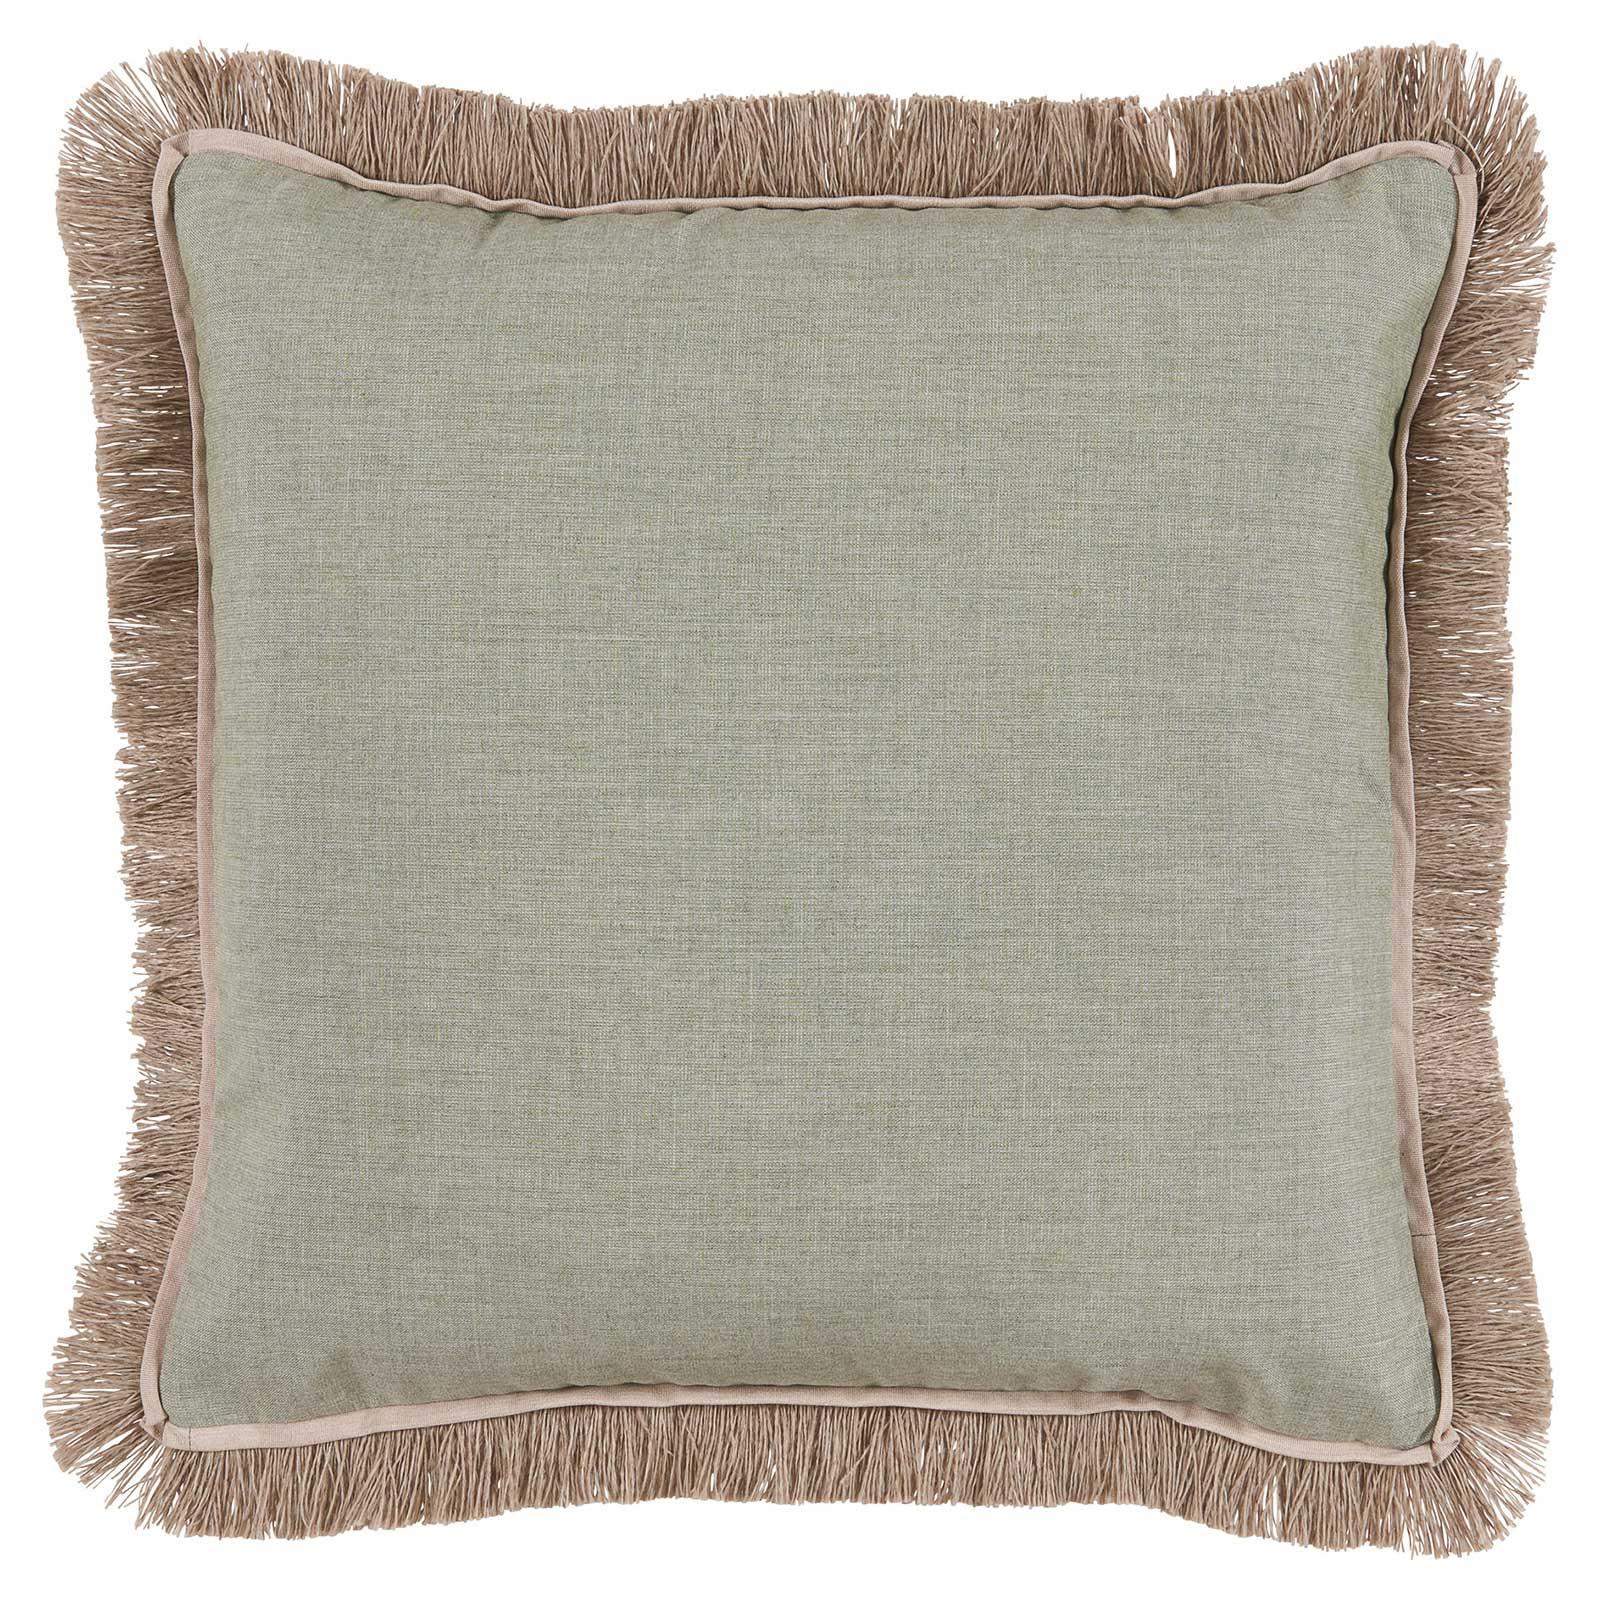 Talli Regency Fringe Sage Outdoor Pillow - 20x20